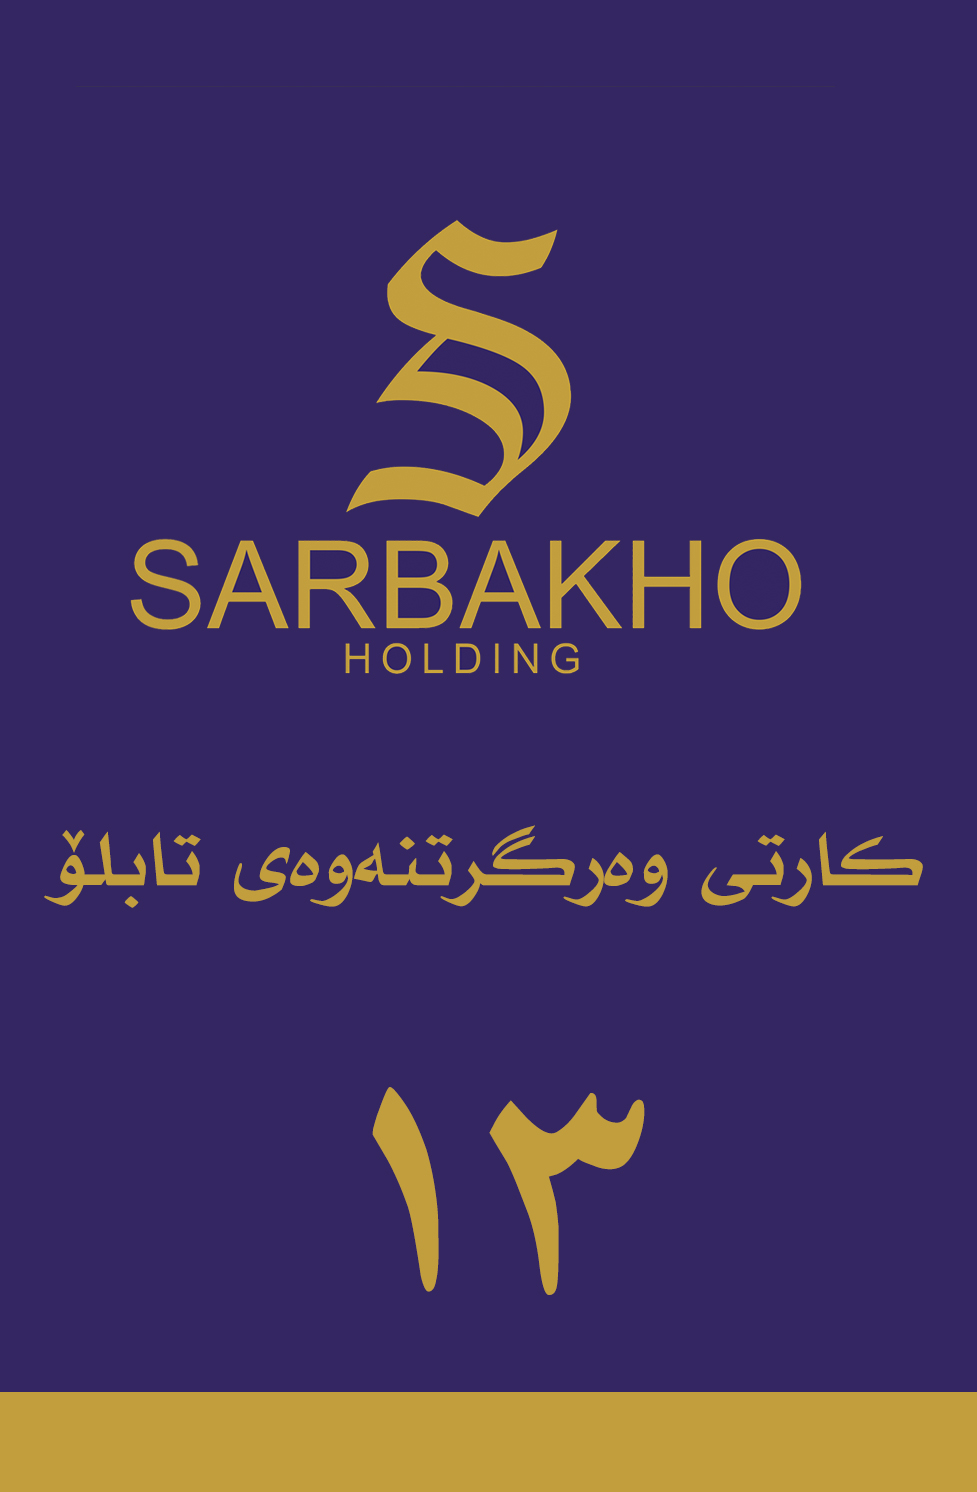 sarbakho logo2-8